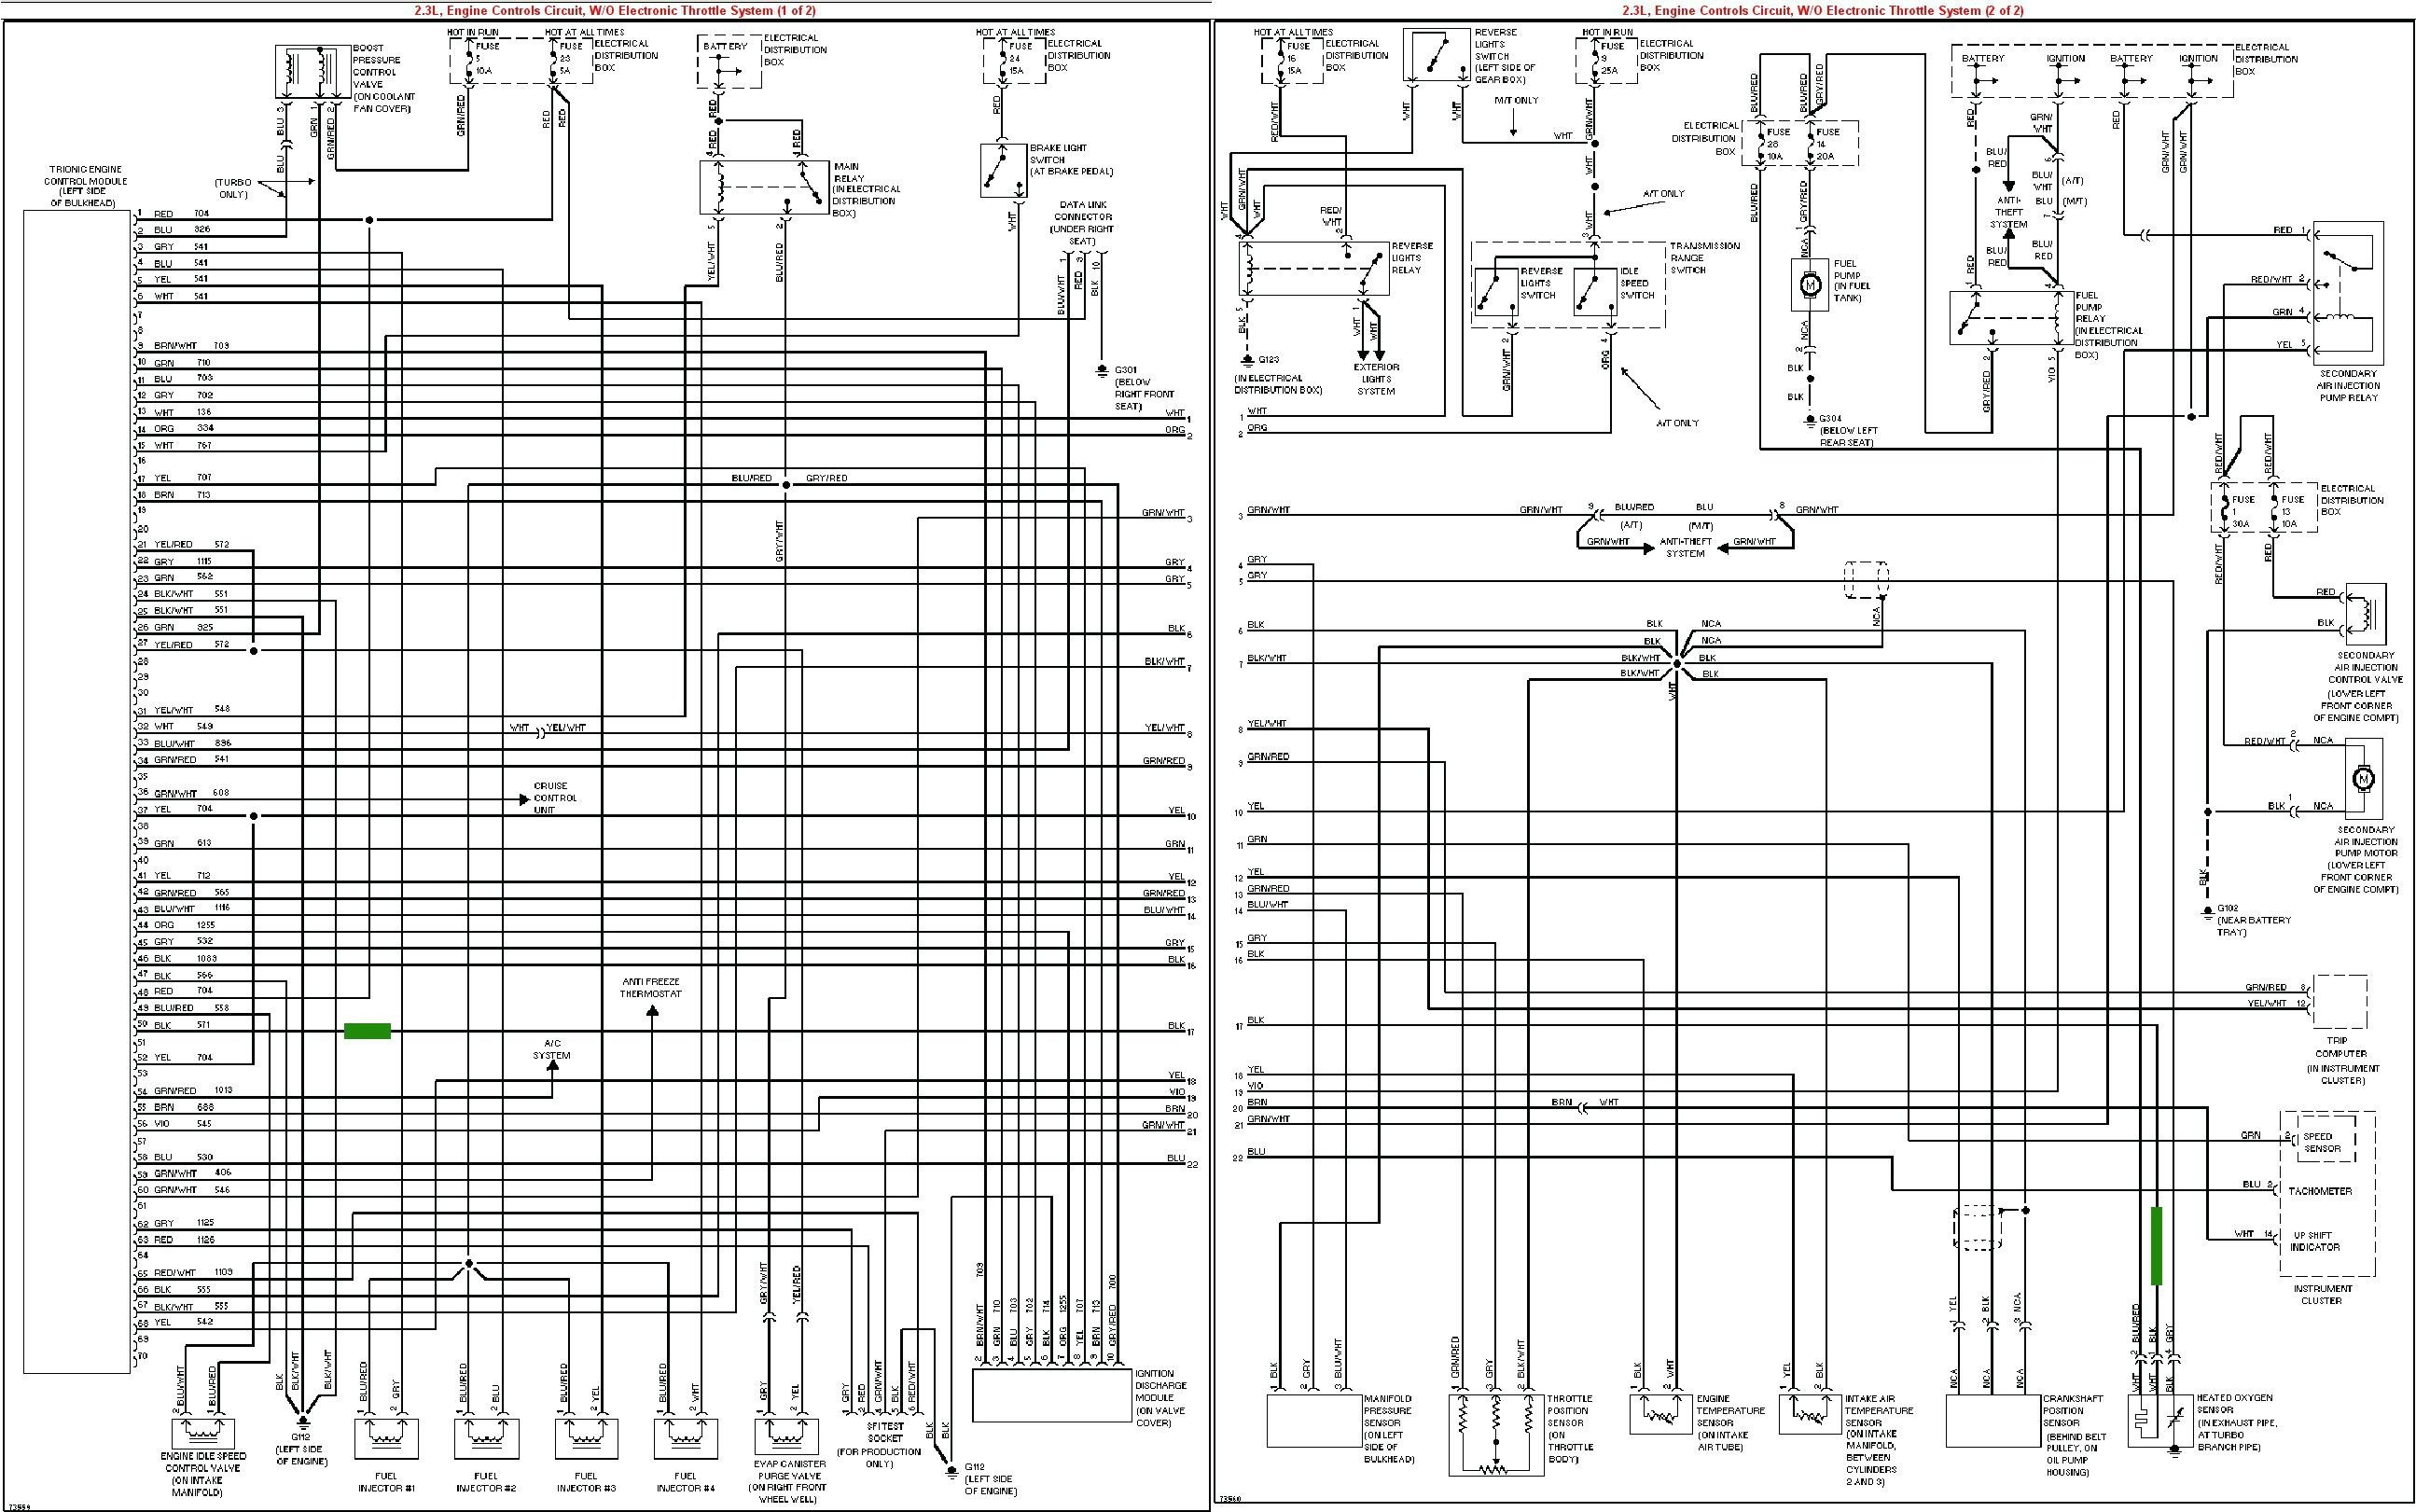 Wiring Diagram For Doorbell Transformer Car Schematic Diagrams 2005 Subaru Outback Seat M Ms